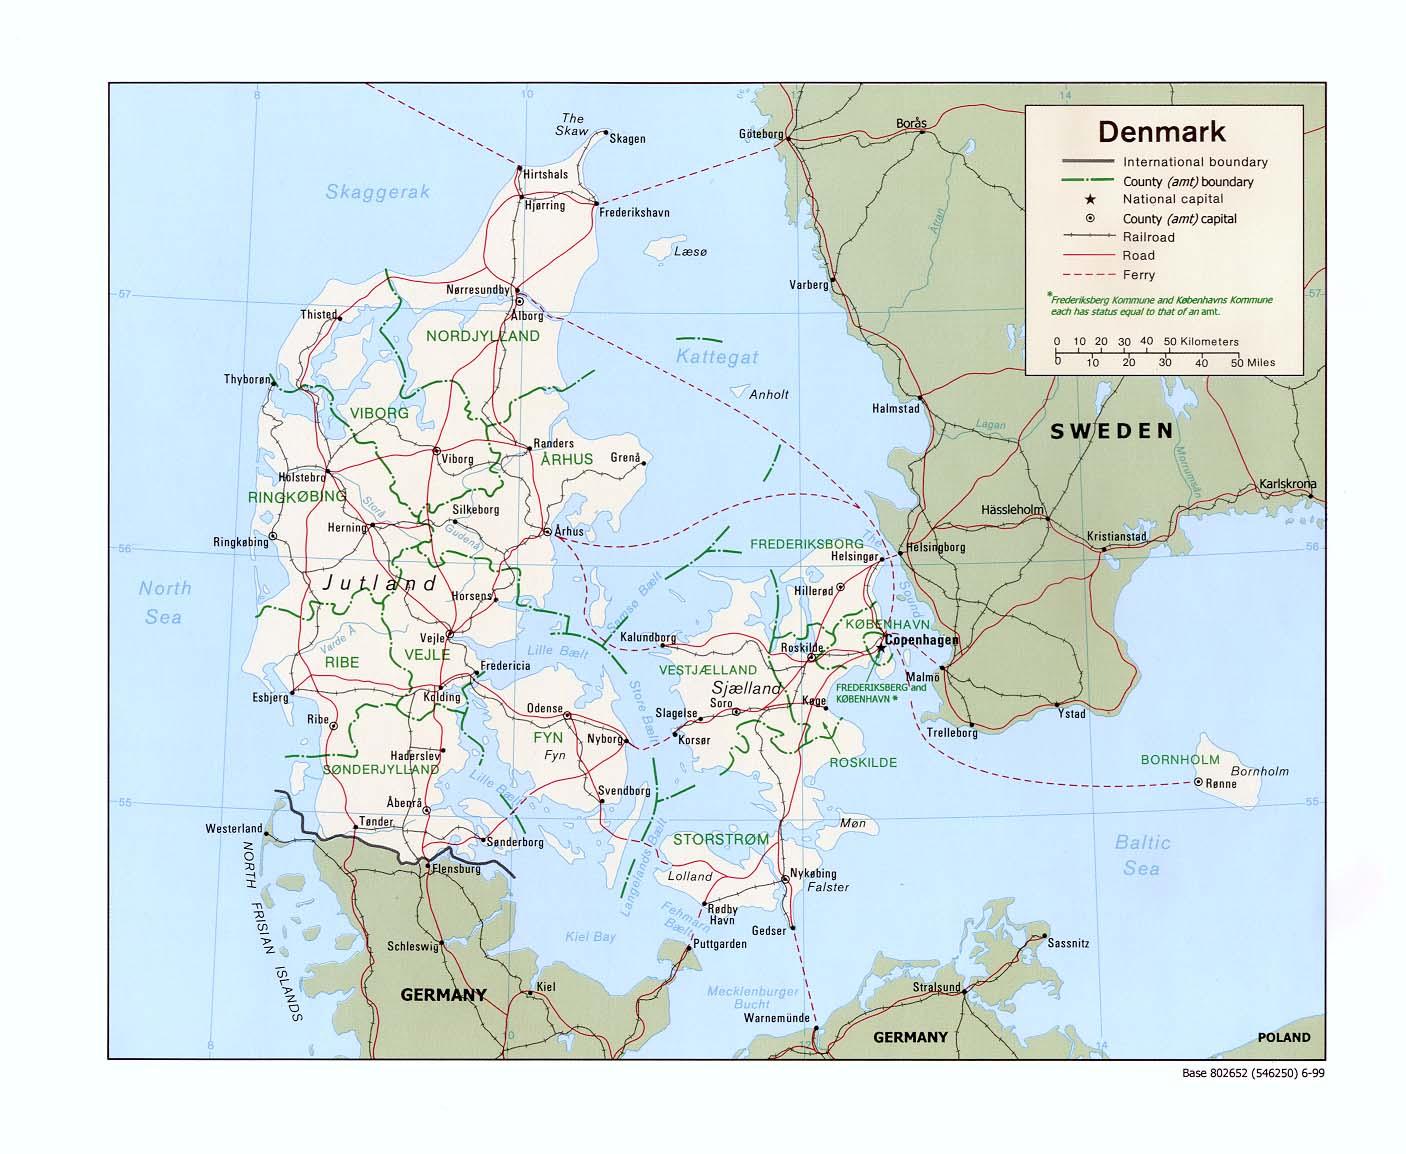 Dänemark Karte, Landkarte